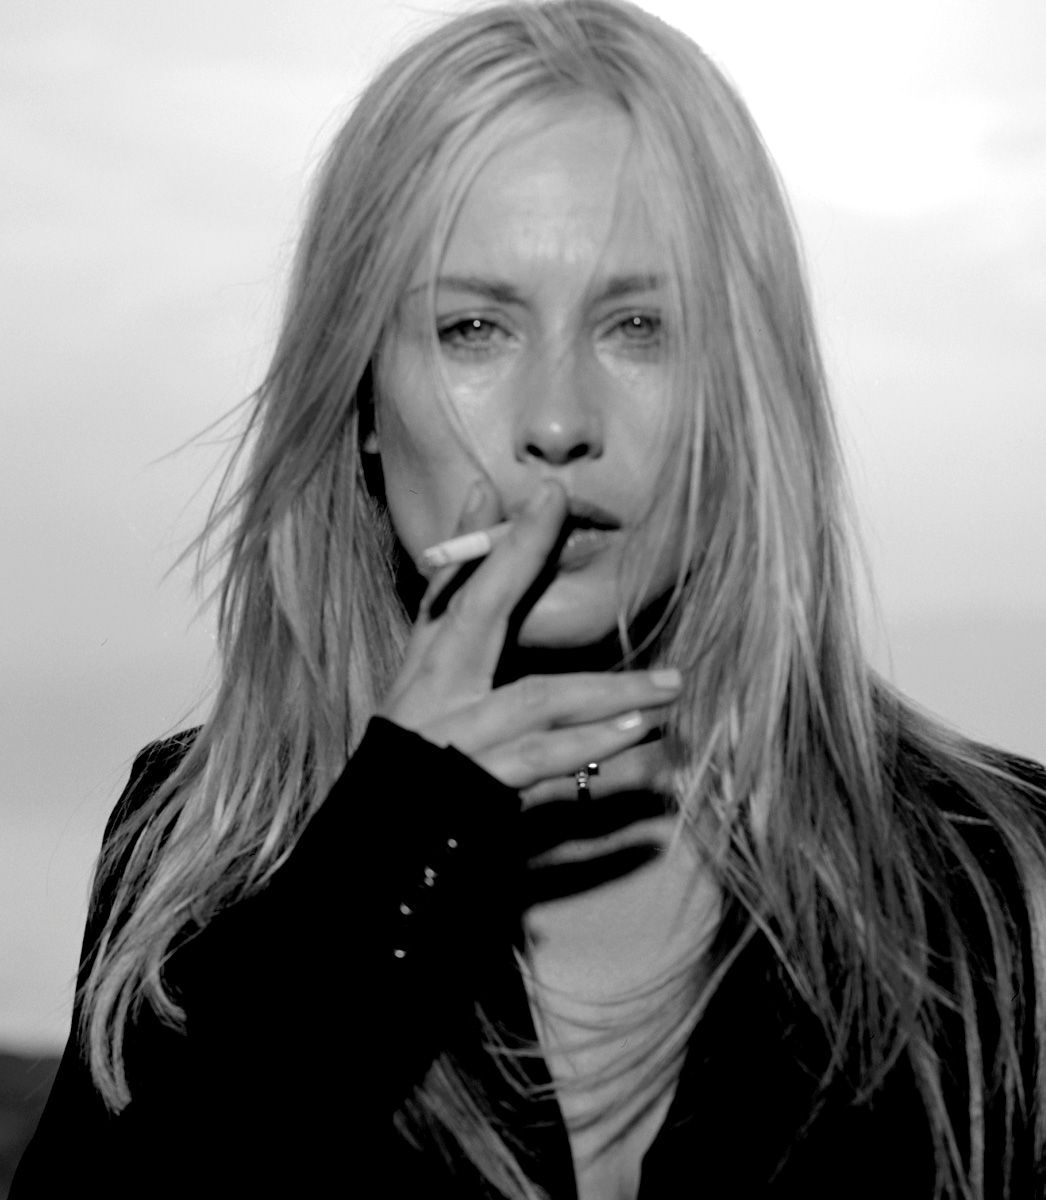 Alyson Croft,Susan Batson Sex videos Louise Germaine,Chloe Leland